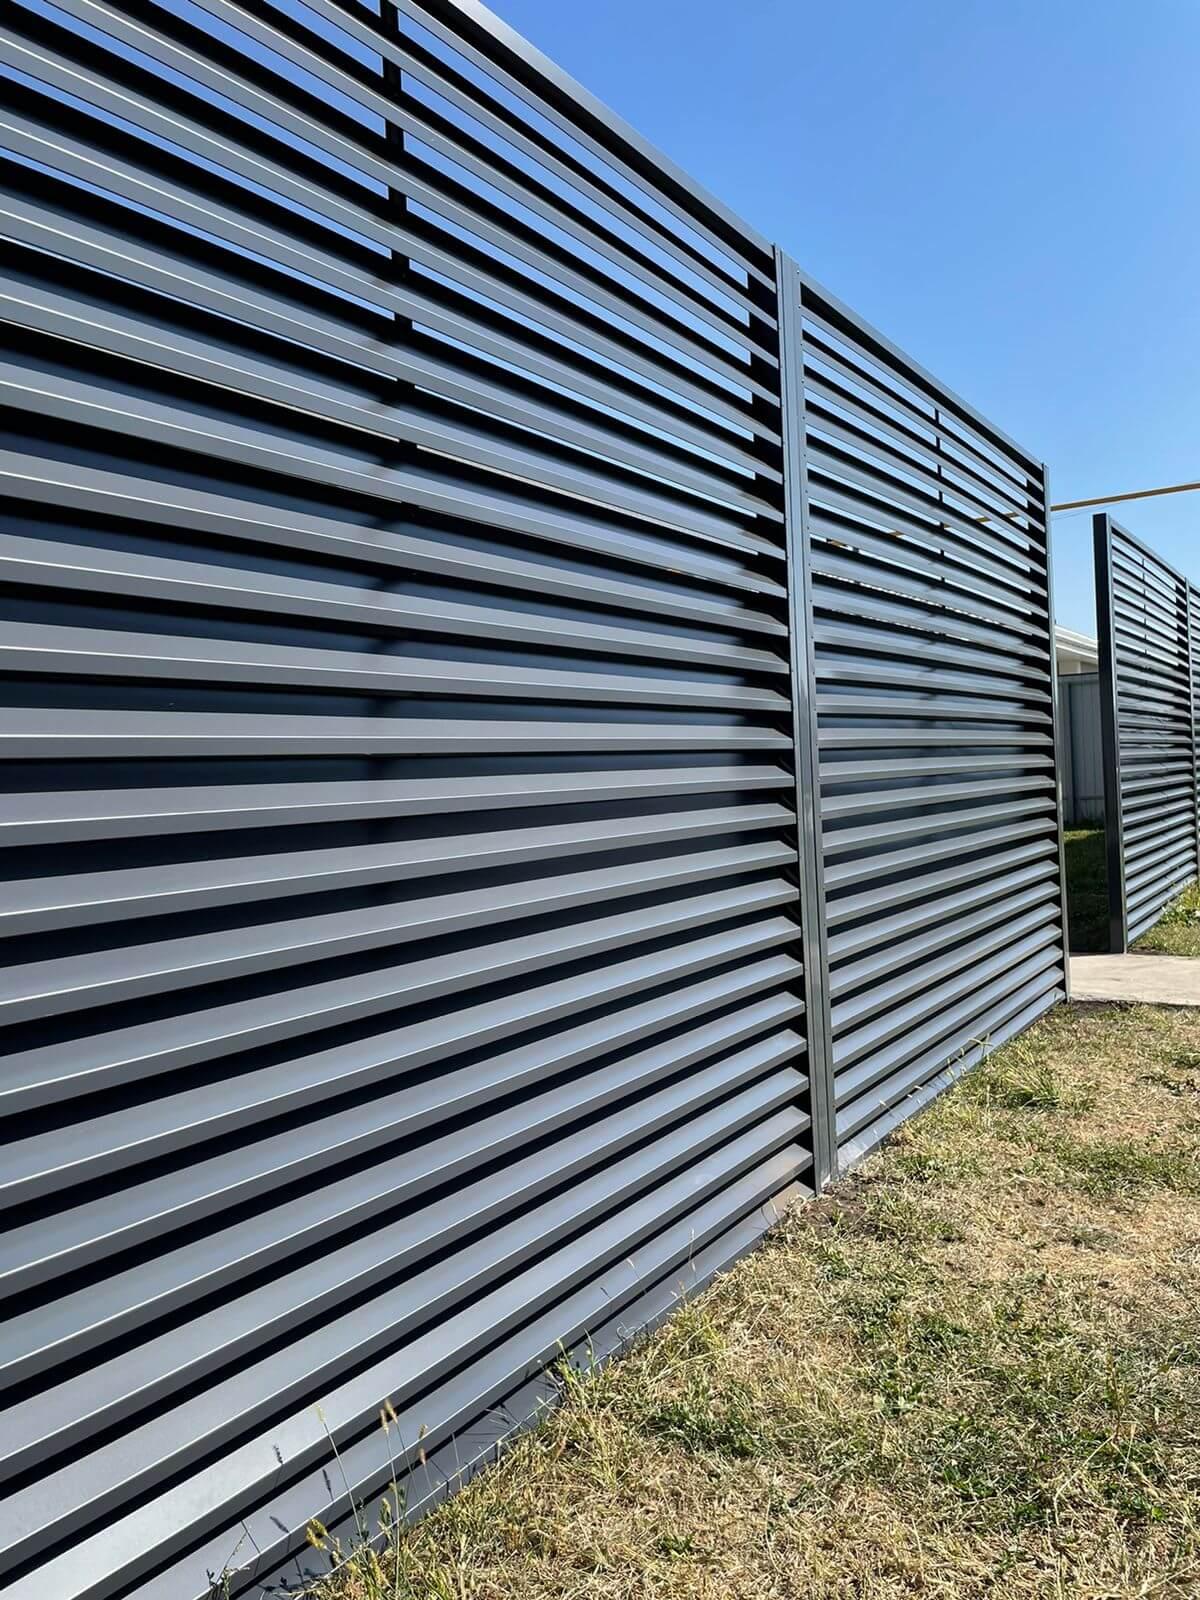 забор-жалюзи с ламелями эко-z ral7024/7024 серый графит двухсторонний фото4